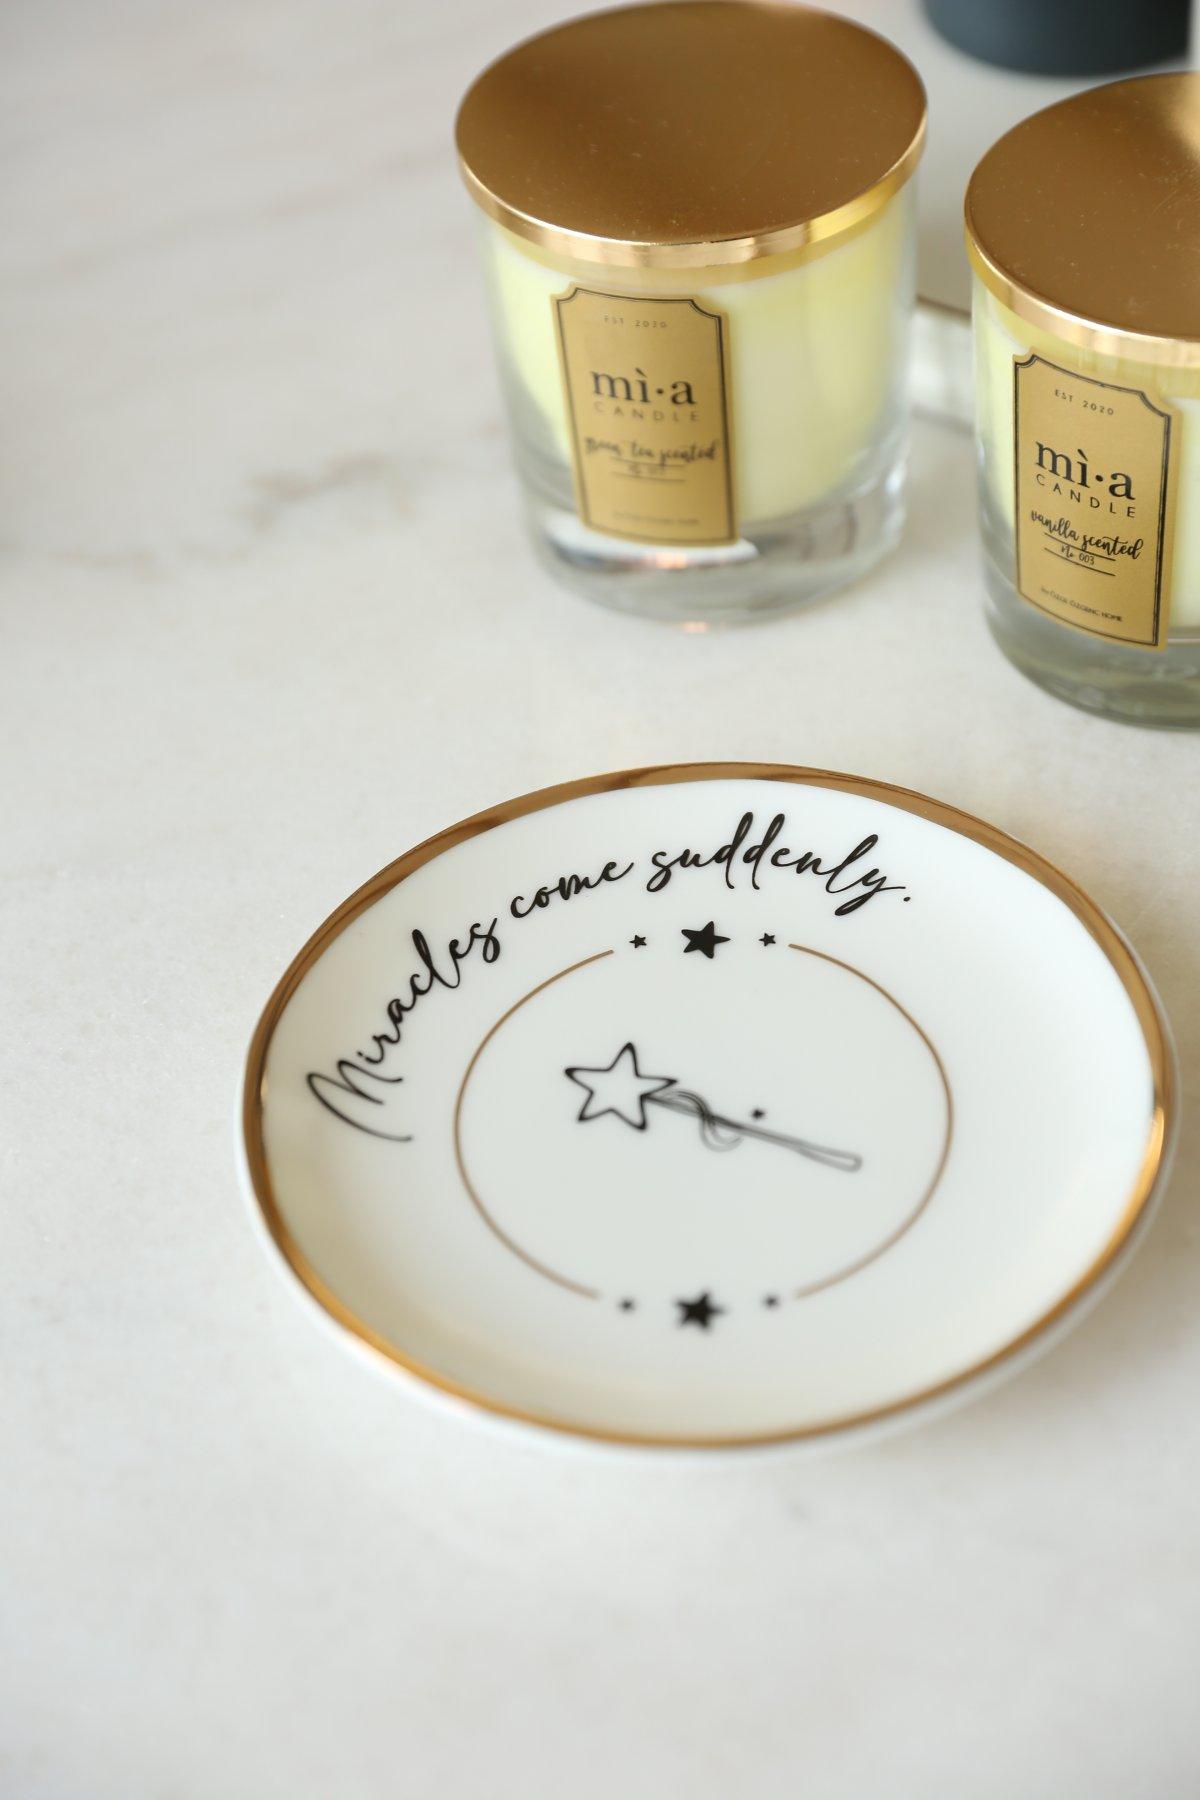 Motto Collection Miracles Come Suddenly Tatlı Tabağı